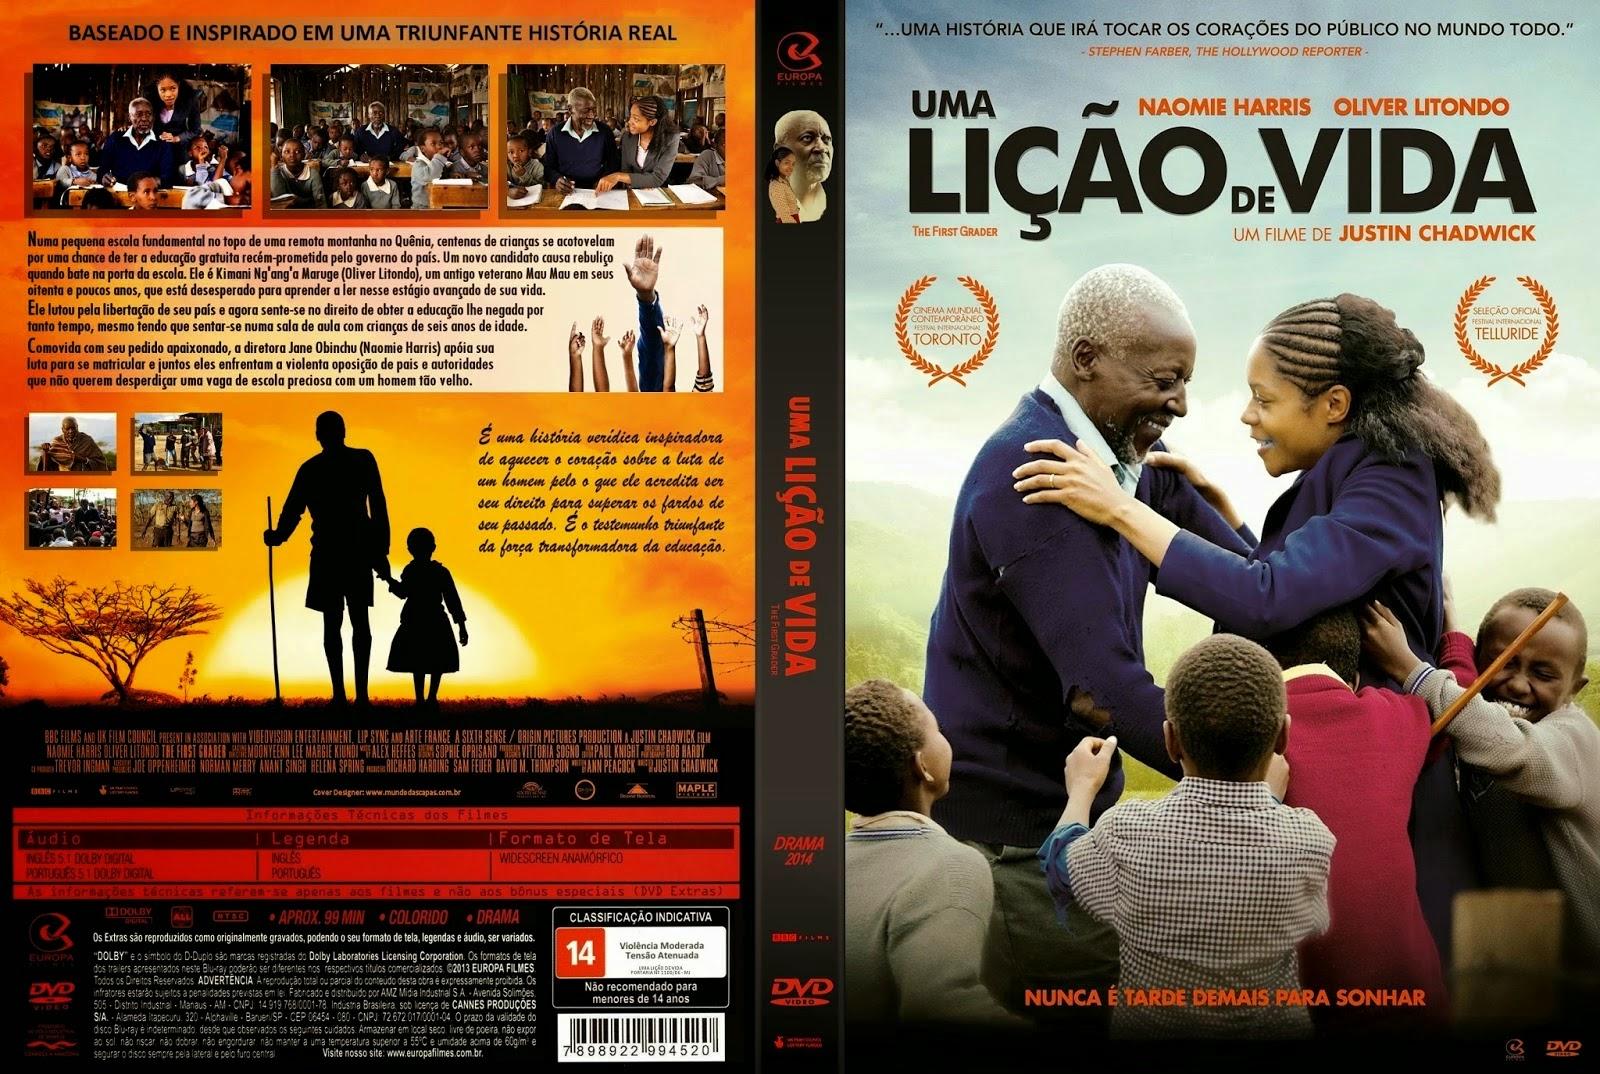 El informante dvd full latino dating